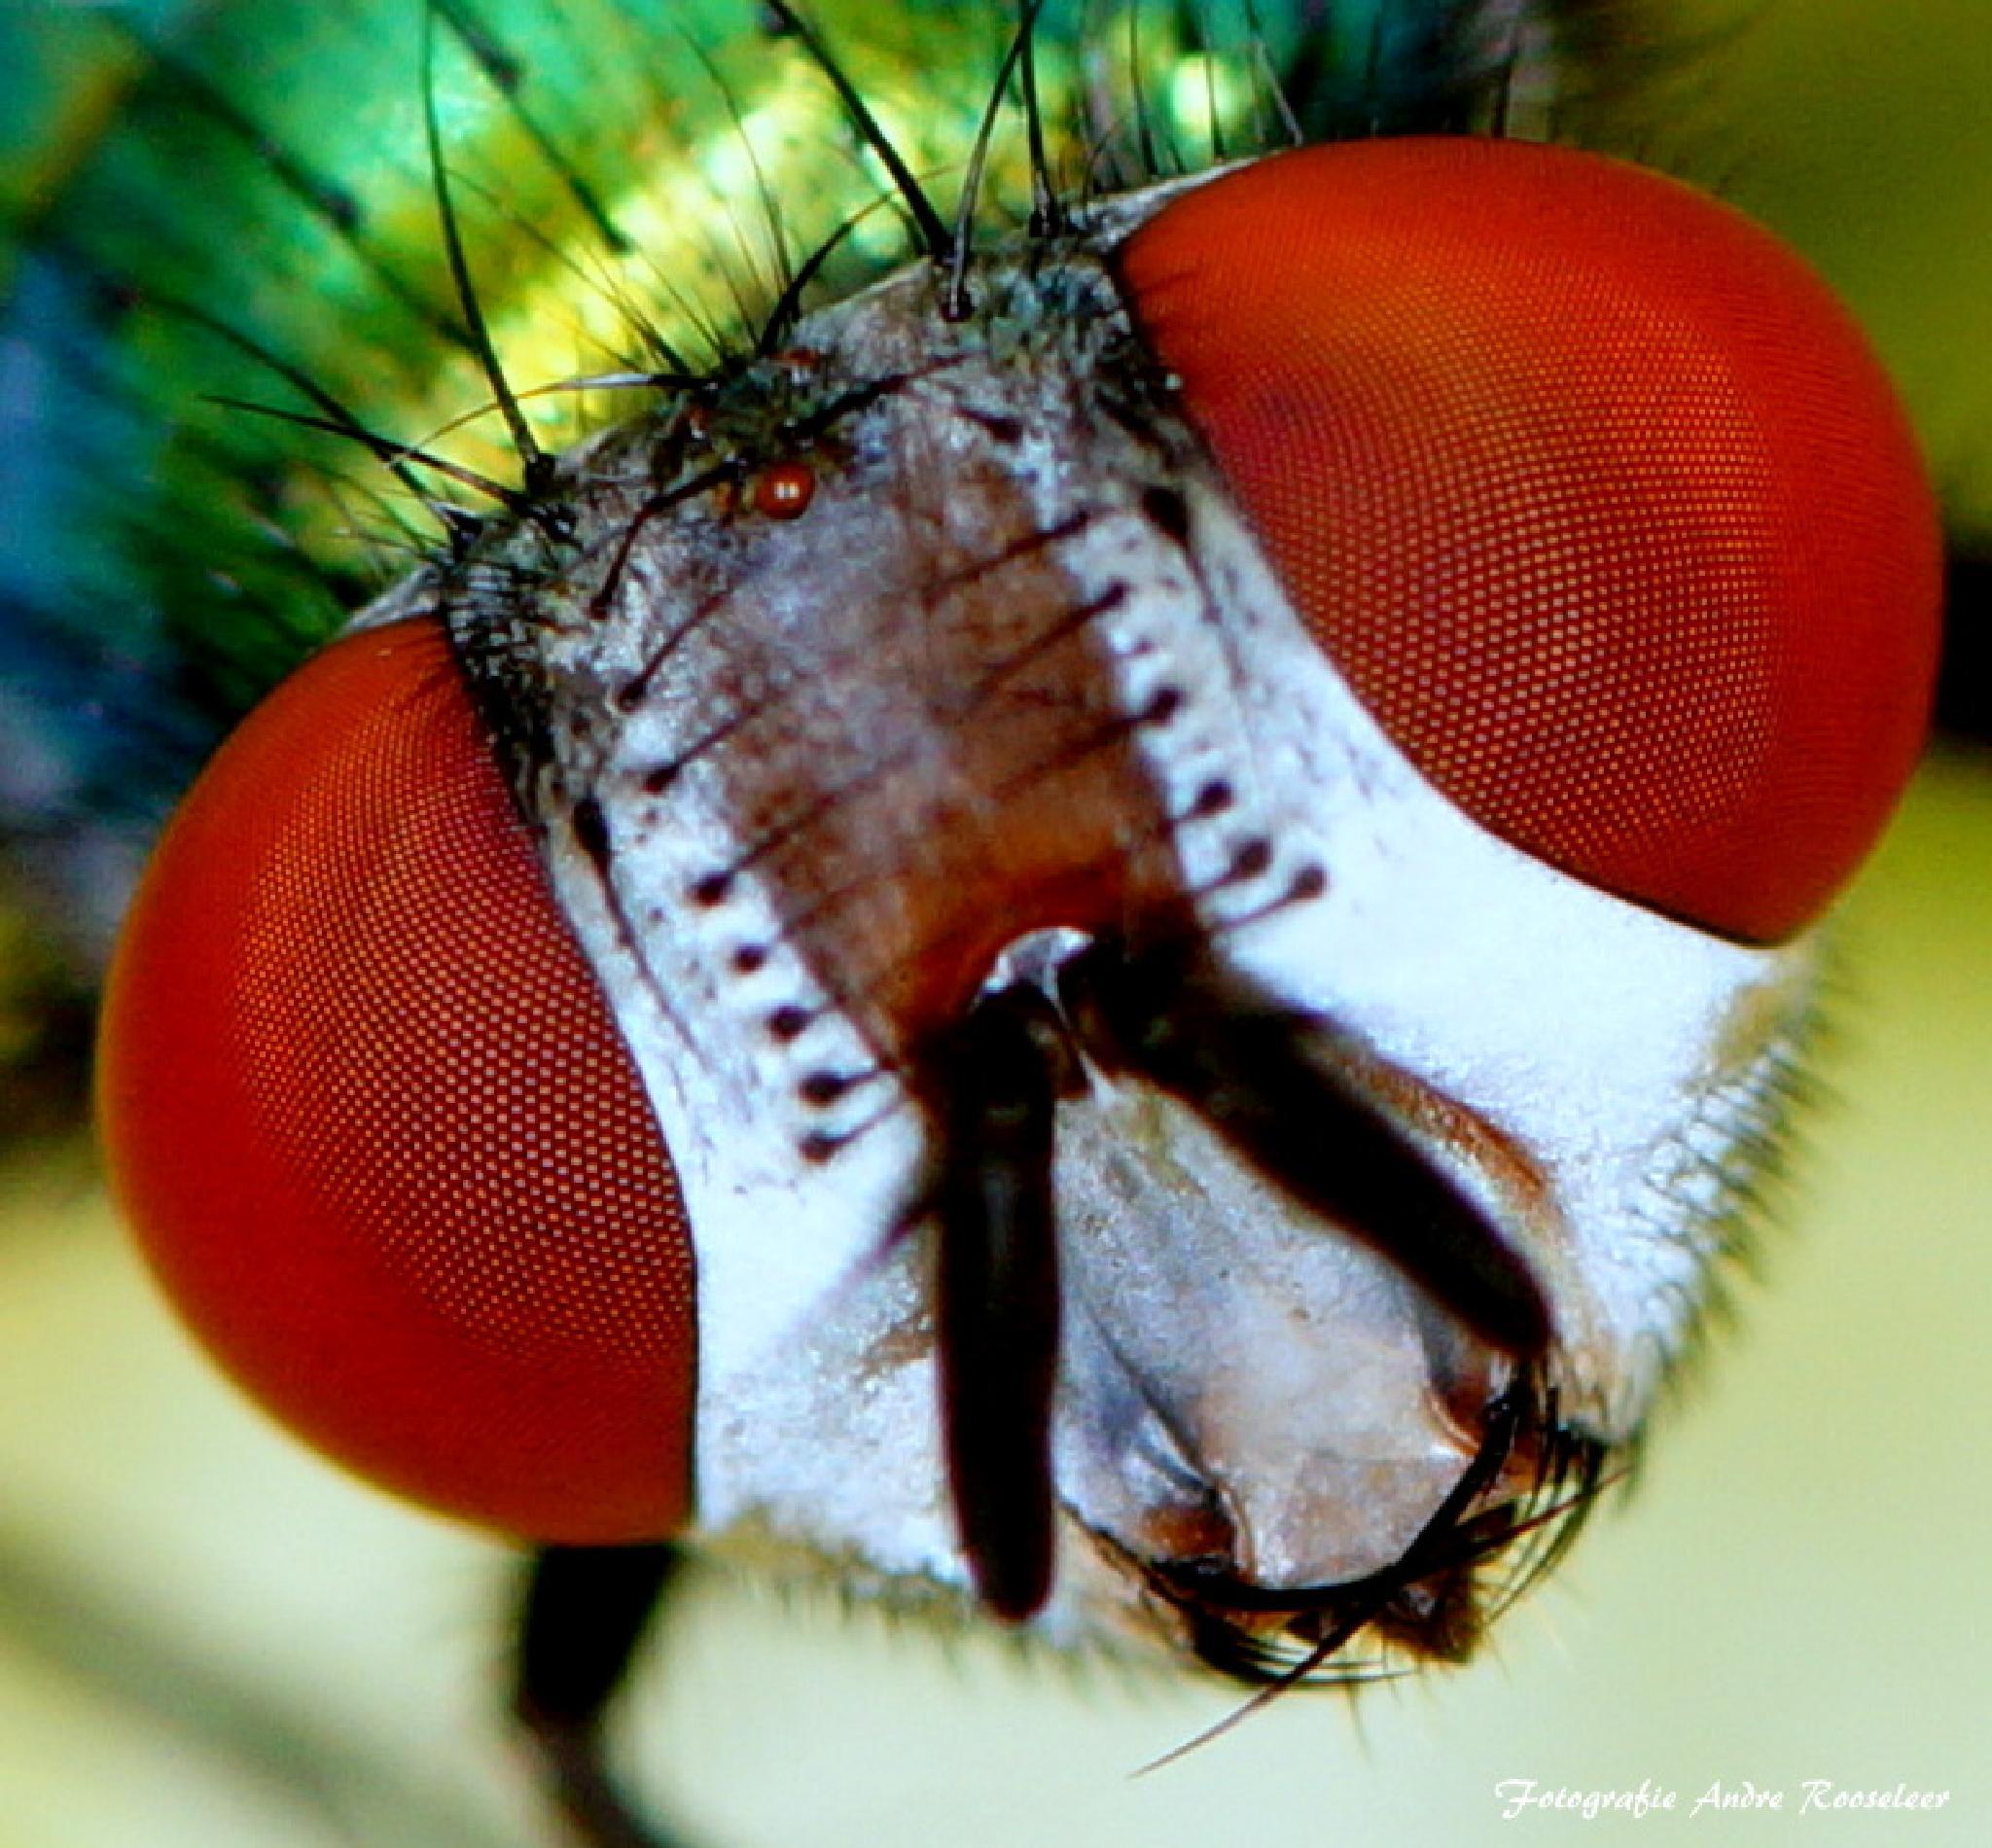 Groene keizersvlieg      Green emperor fly by andre.rooseleer